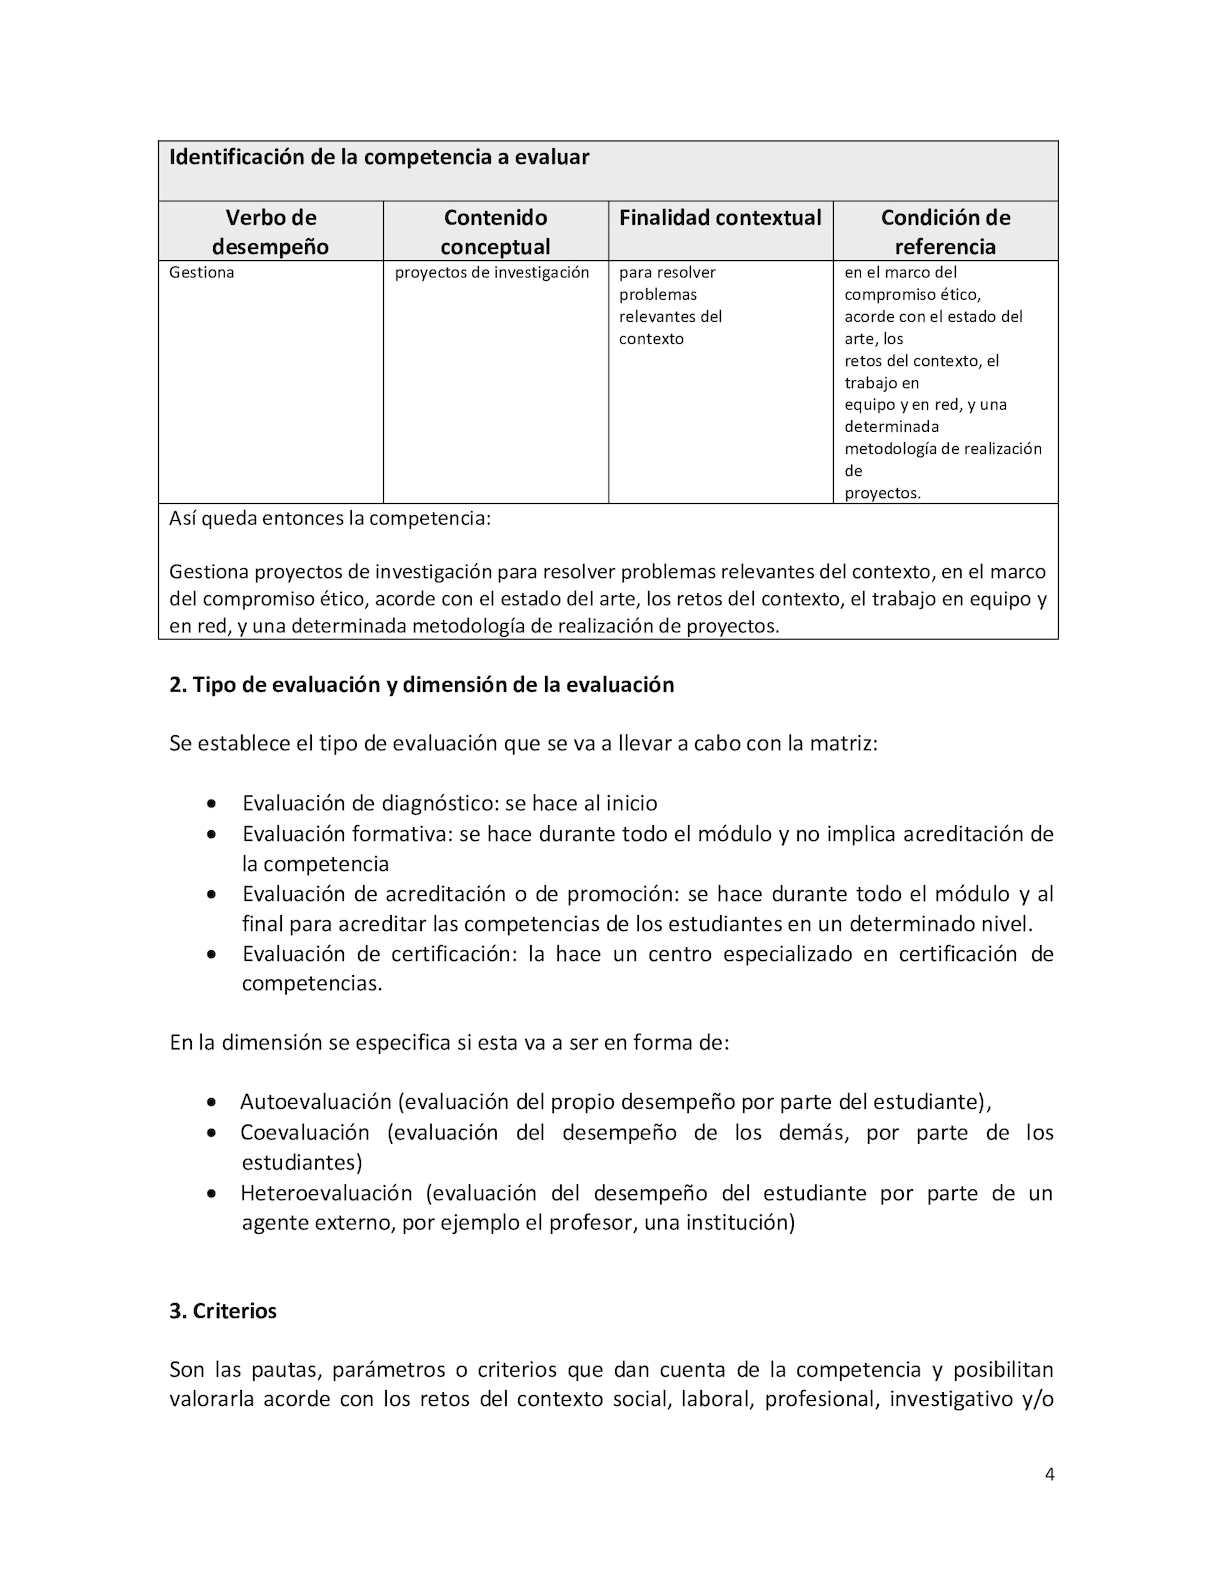 Minedu Matrices De Evaluacion Tobon - CALAMEO Downloader